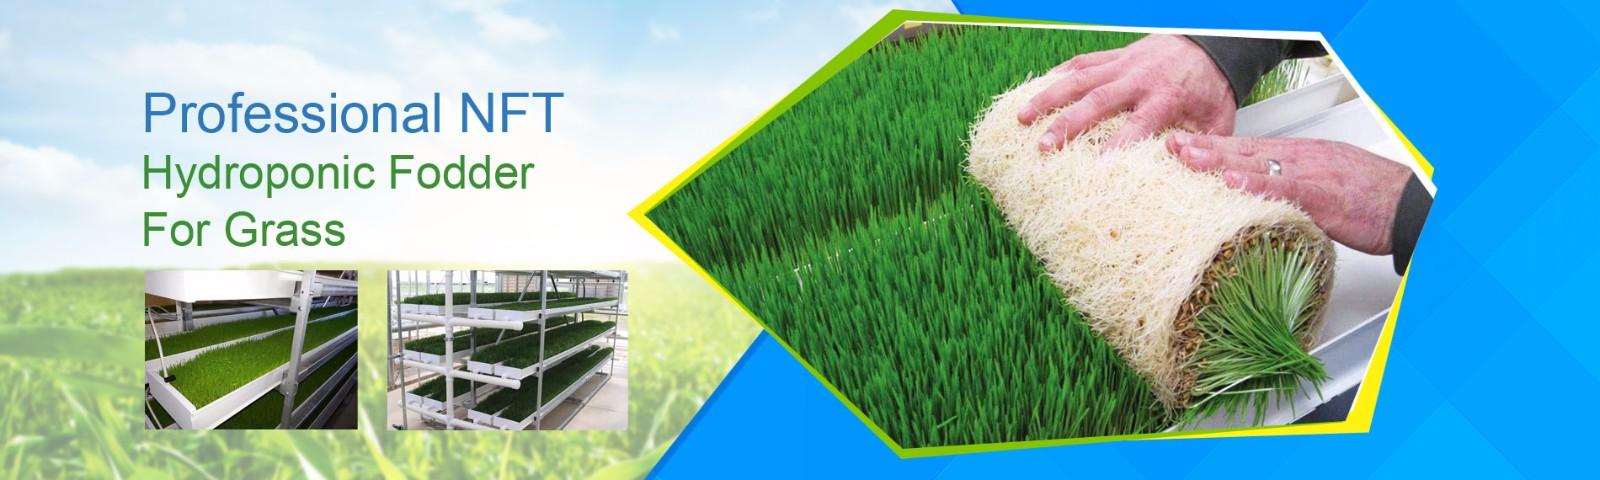 Hydroponic Fodder For Grass